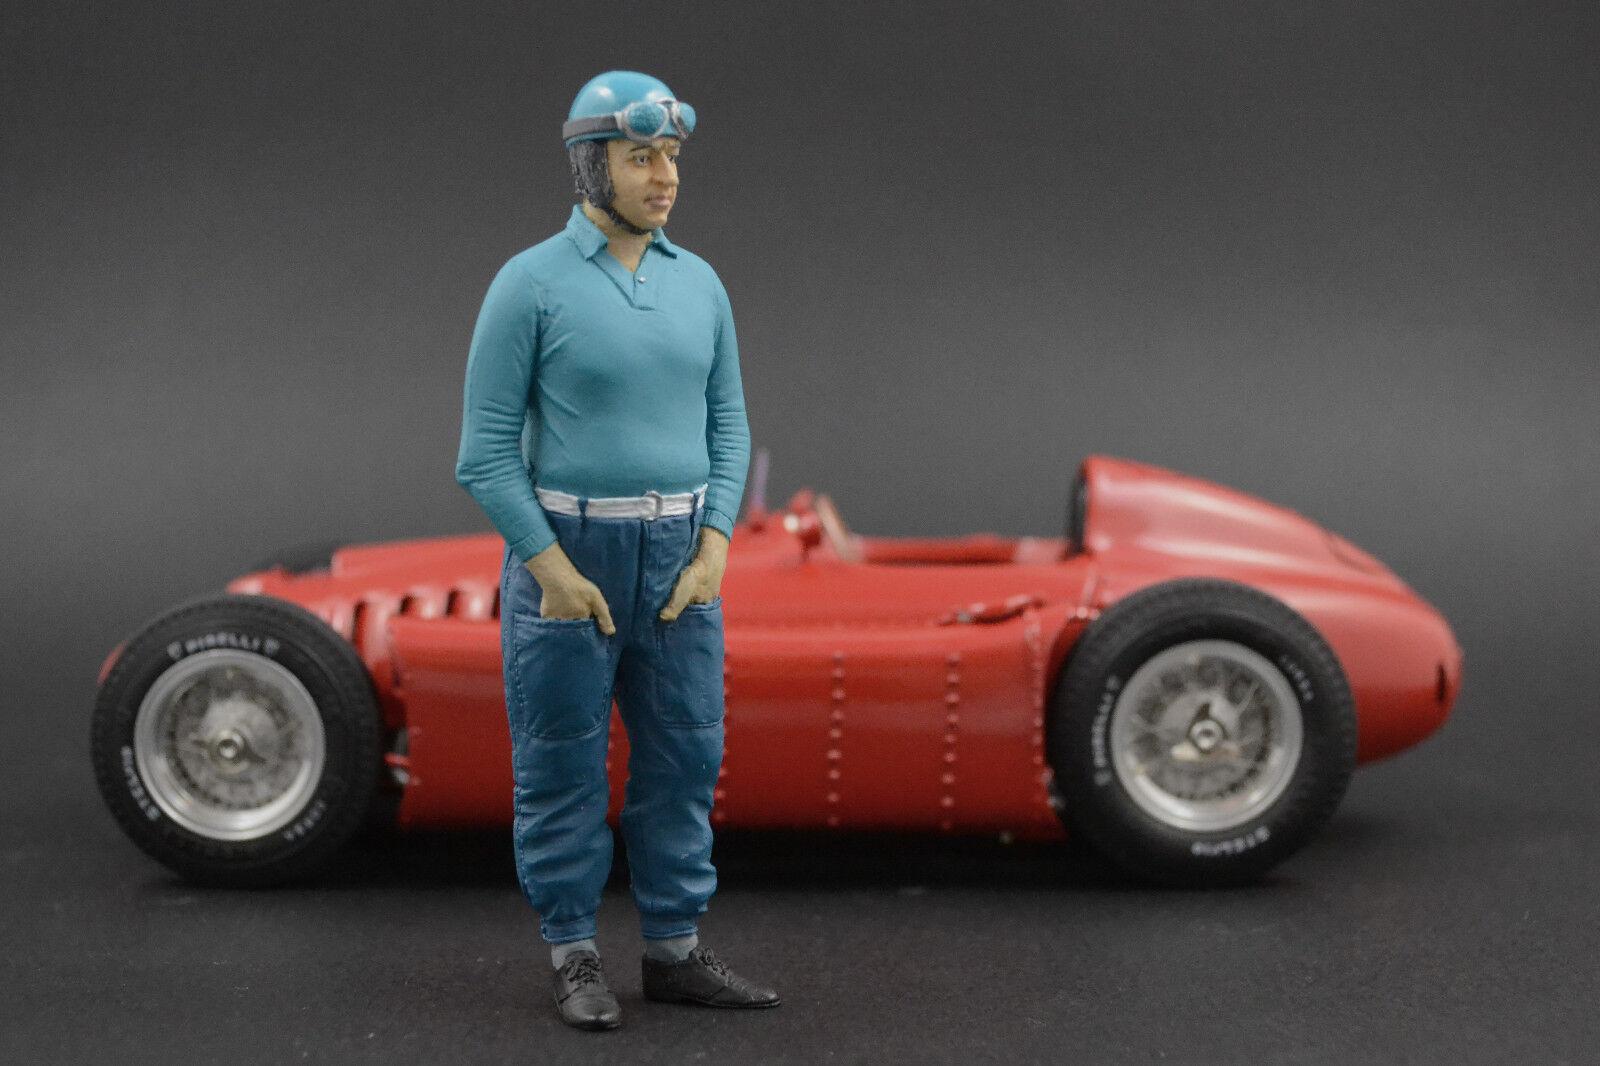 Alberto Ascari Figure pour 1 1 1 18 HotWheels Ferrari 500 375 166 VERY RARE 5028c6